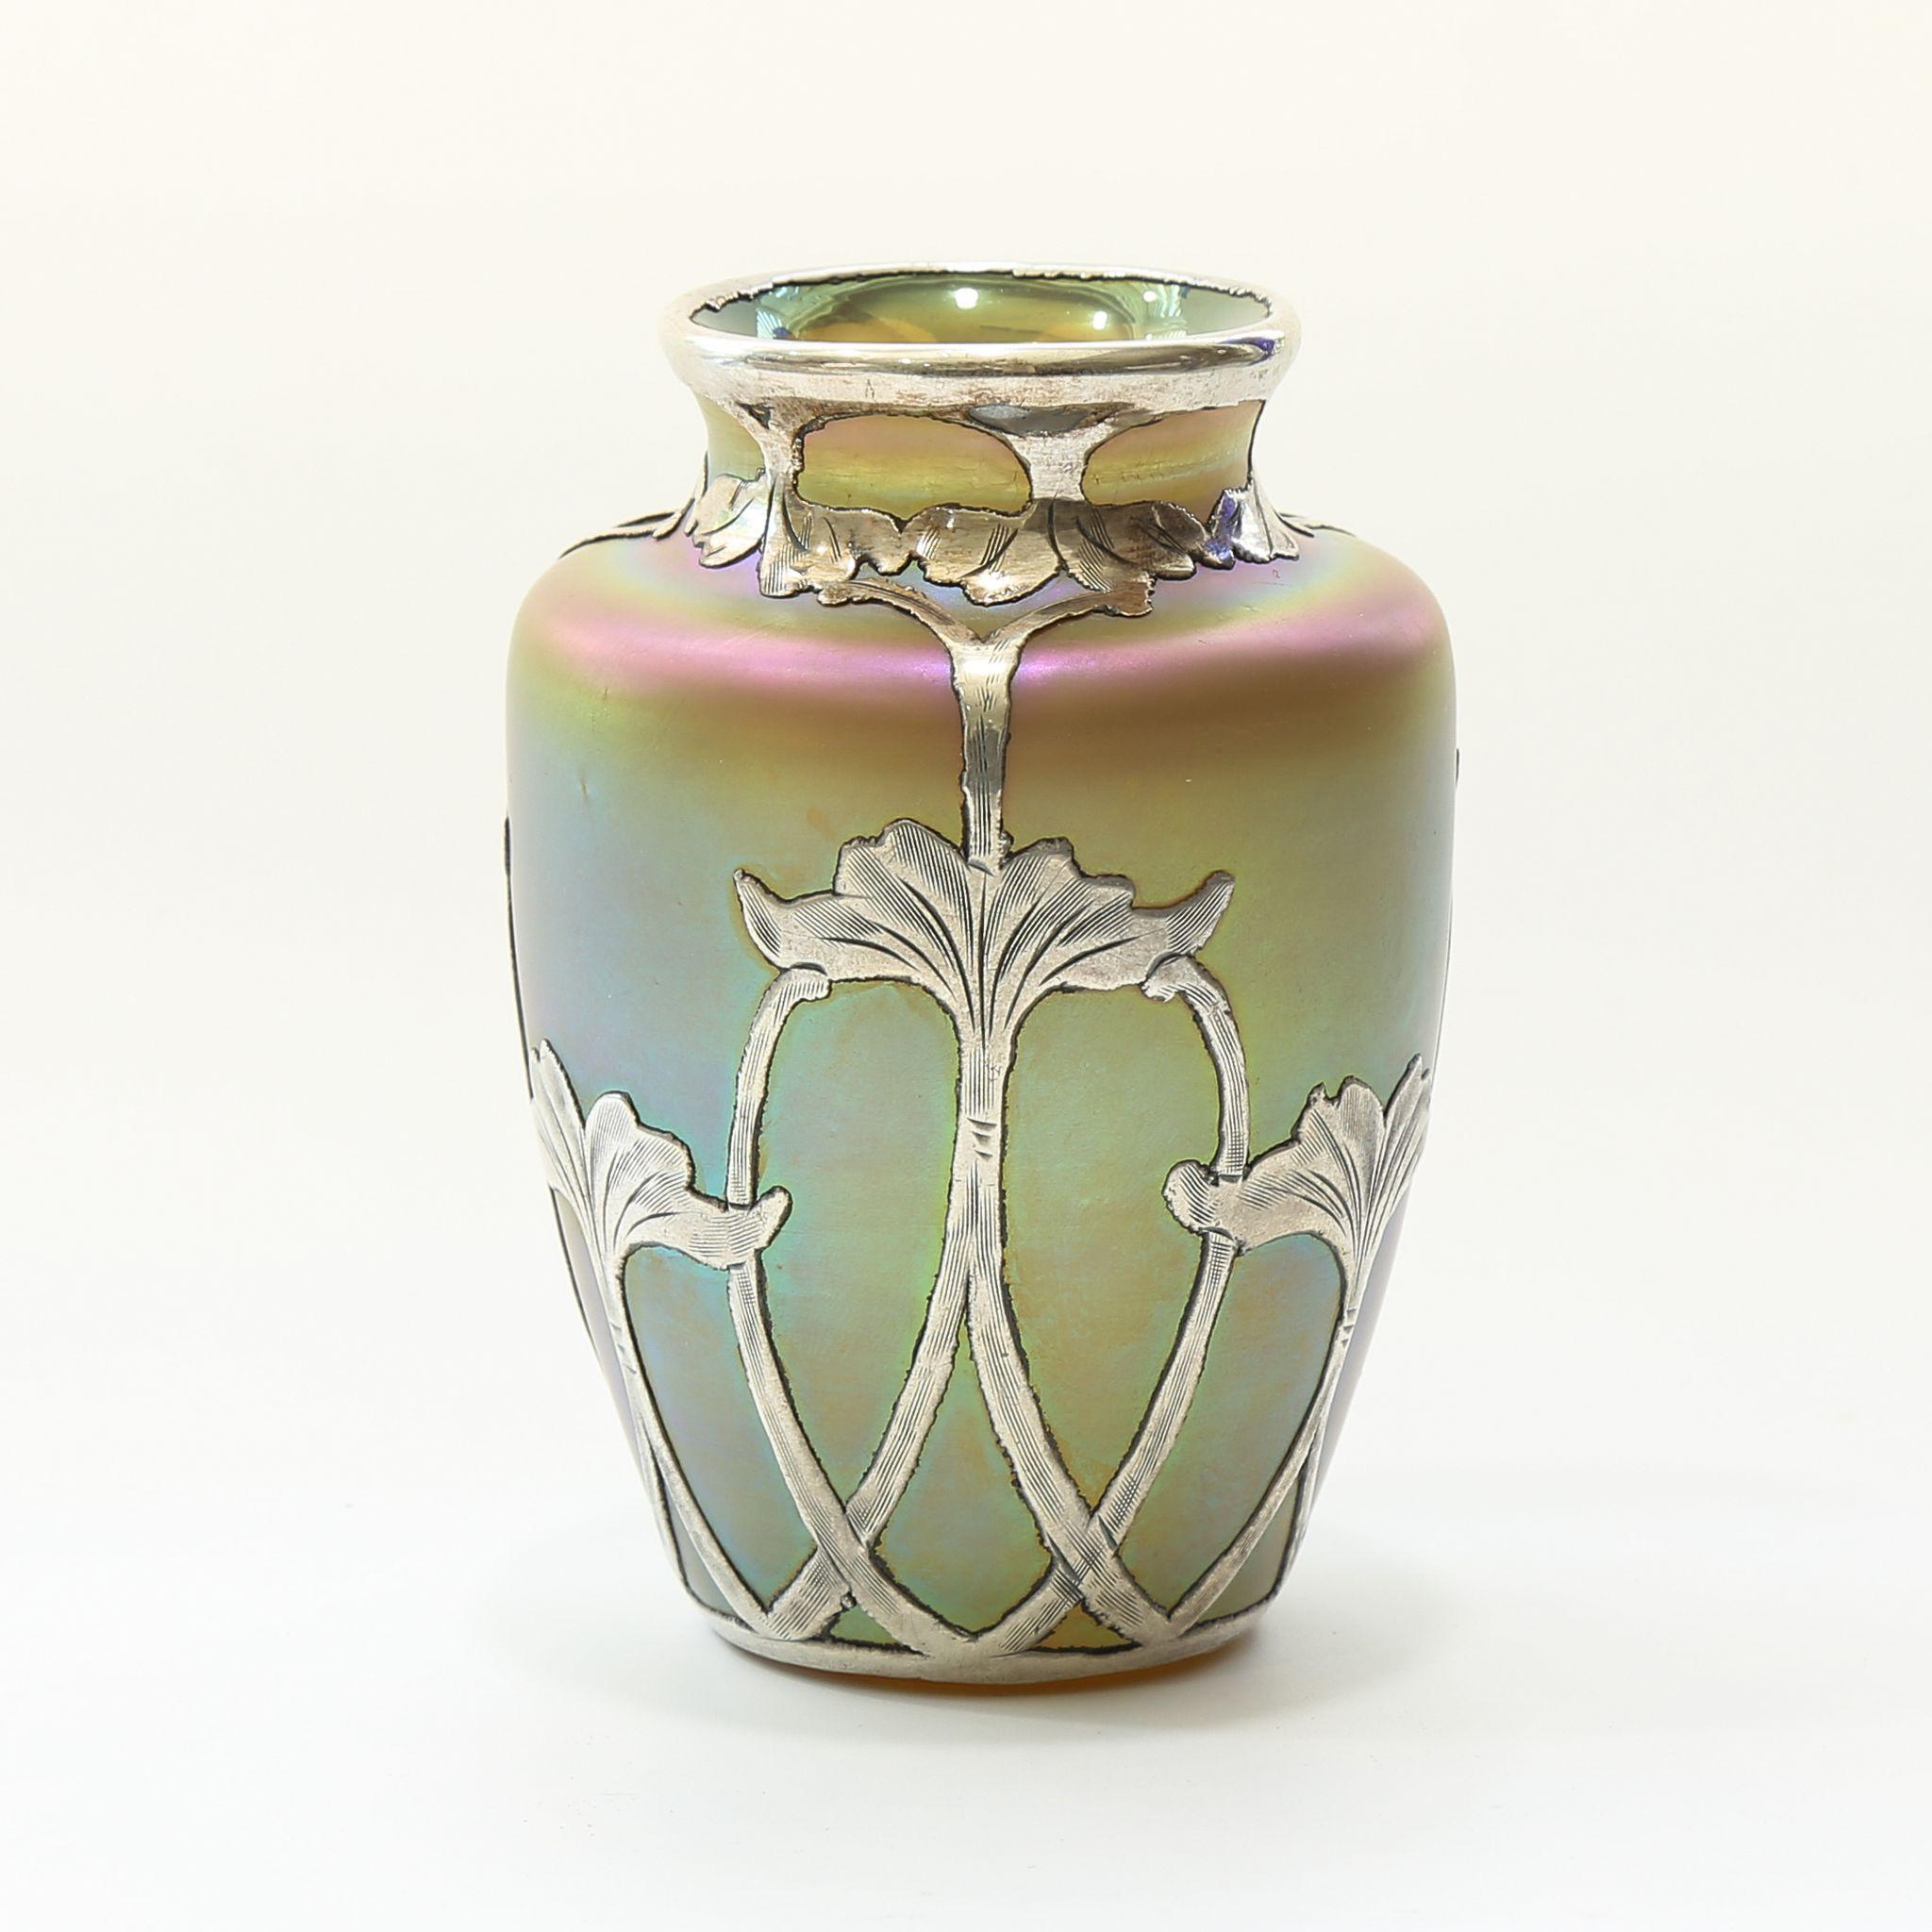 Circa 1900 Loetz Silver Overlay Vase